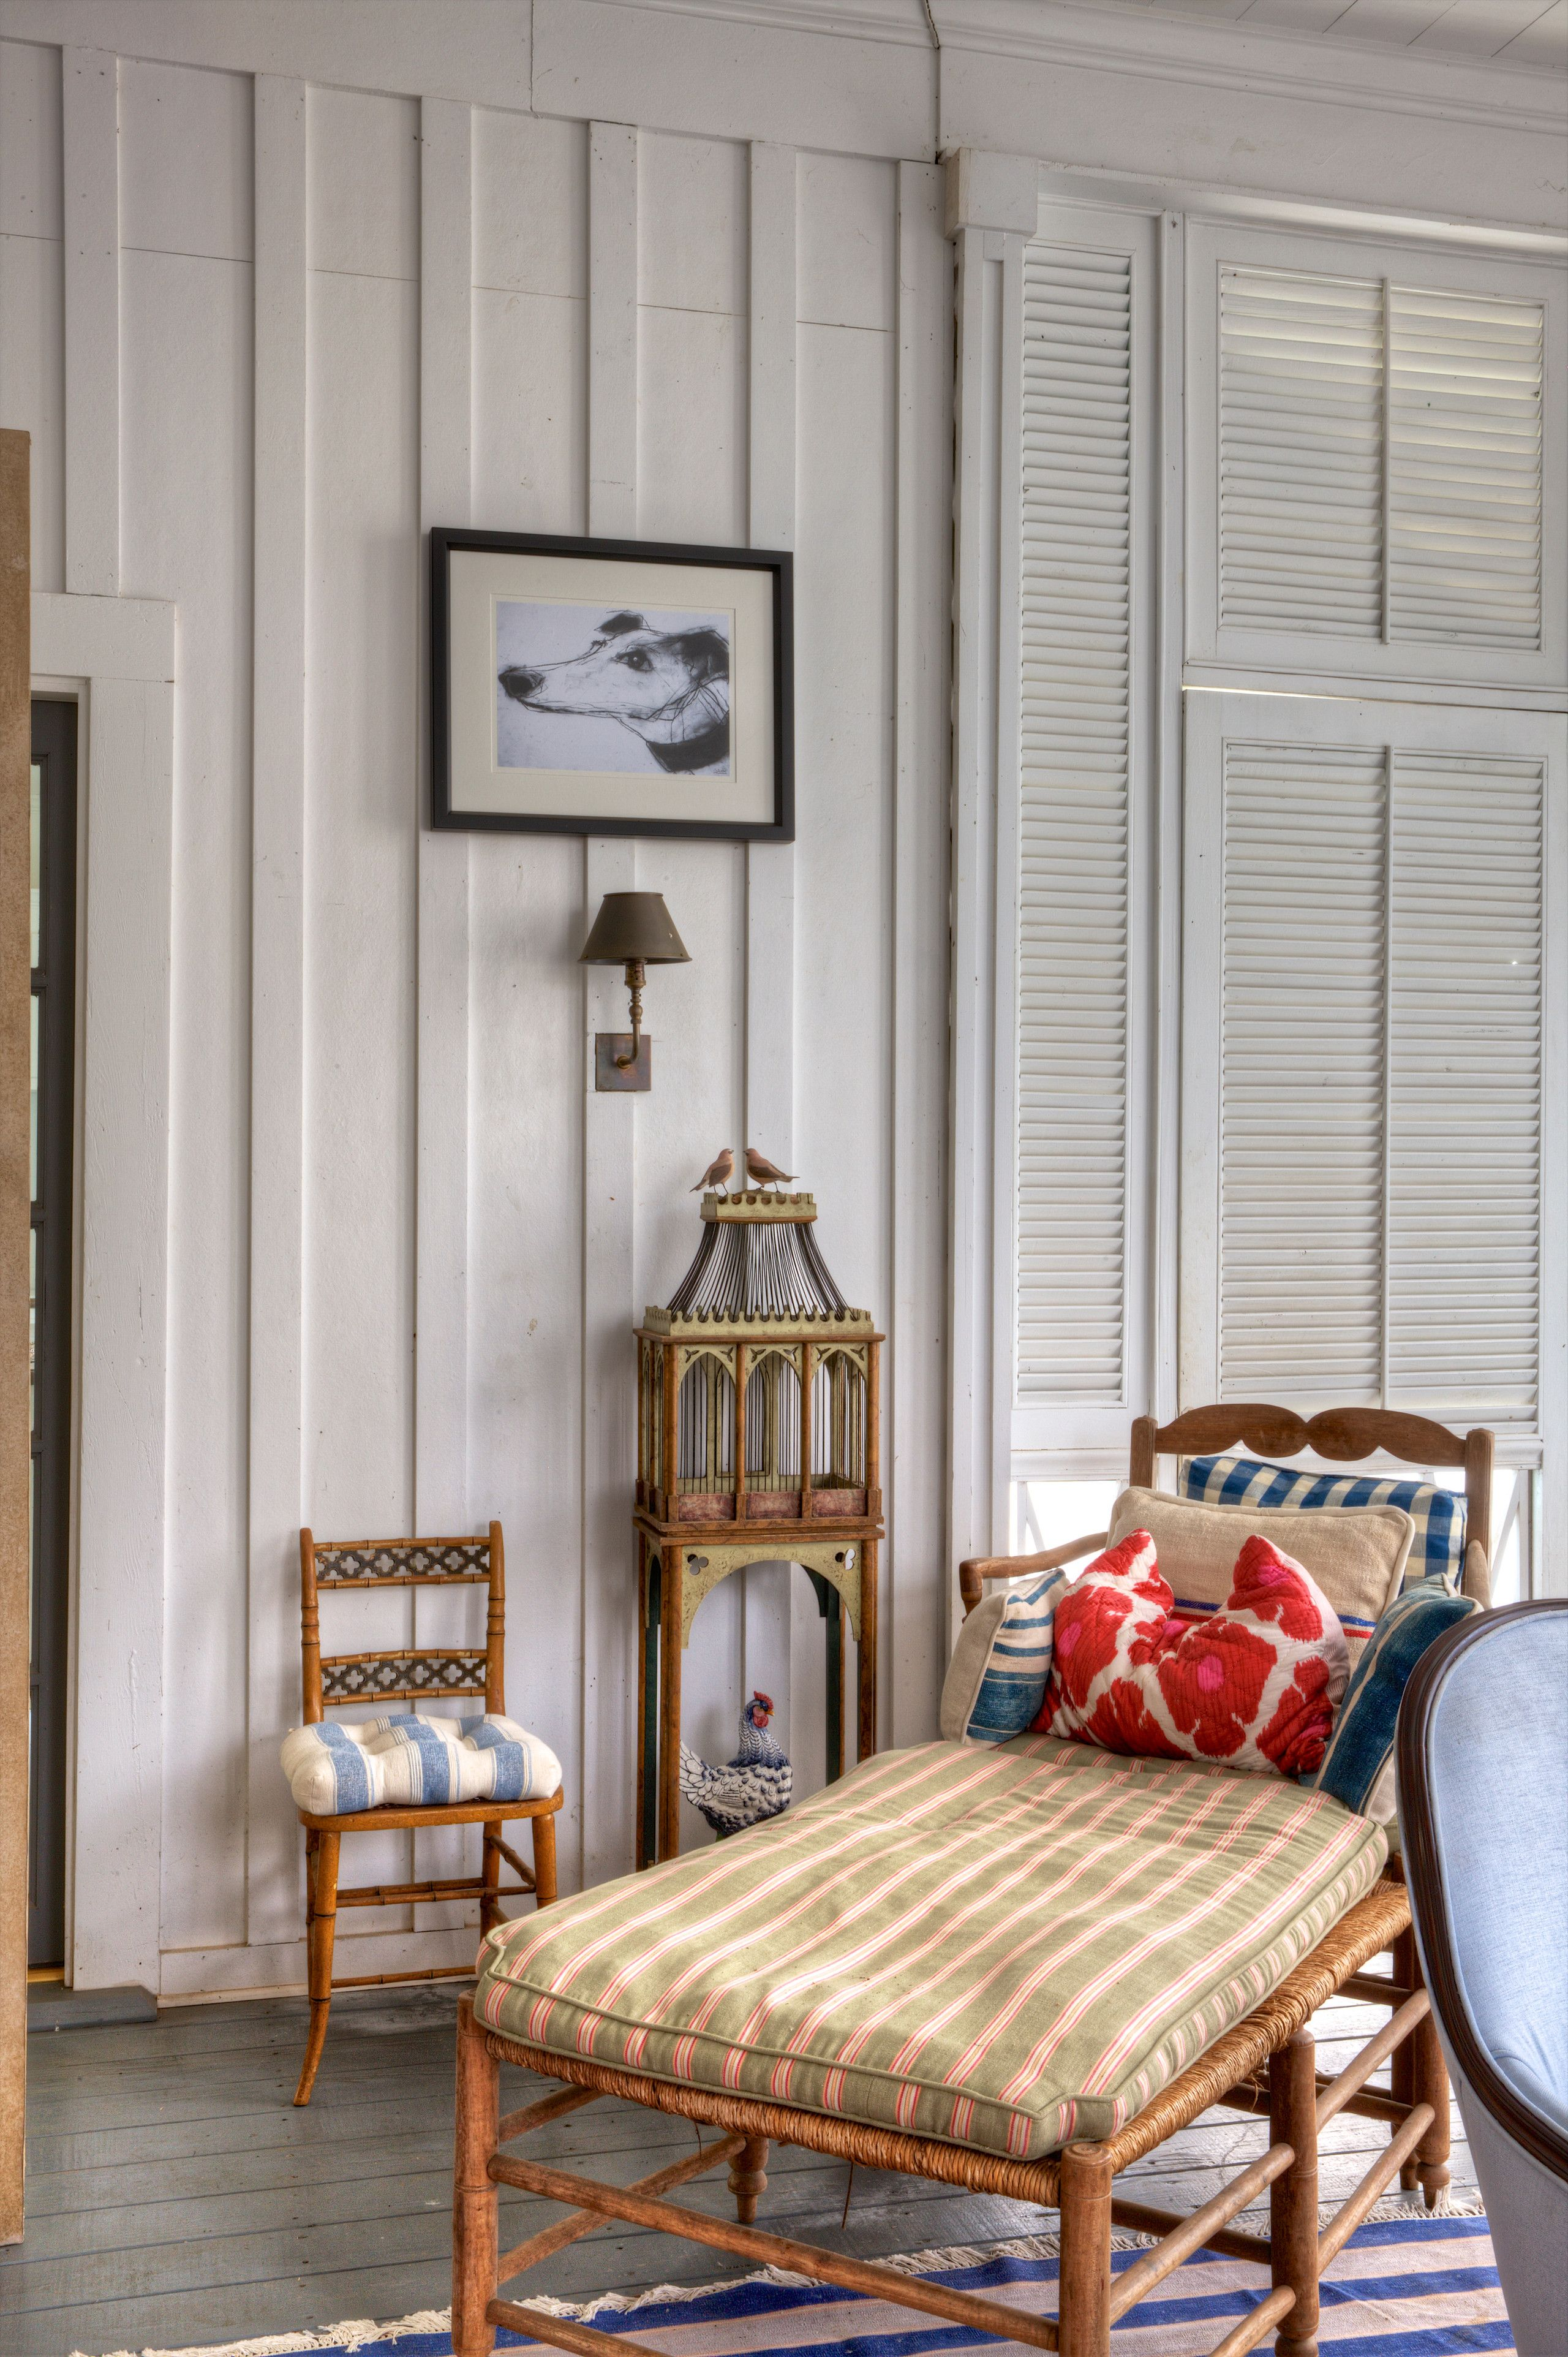 Furlow 121313 Rod Collins Rodcollins Home Decor Home Interior